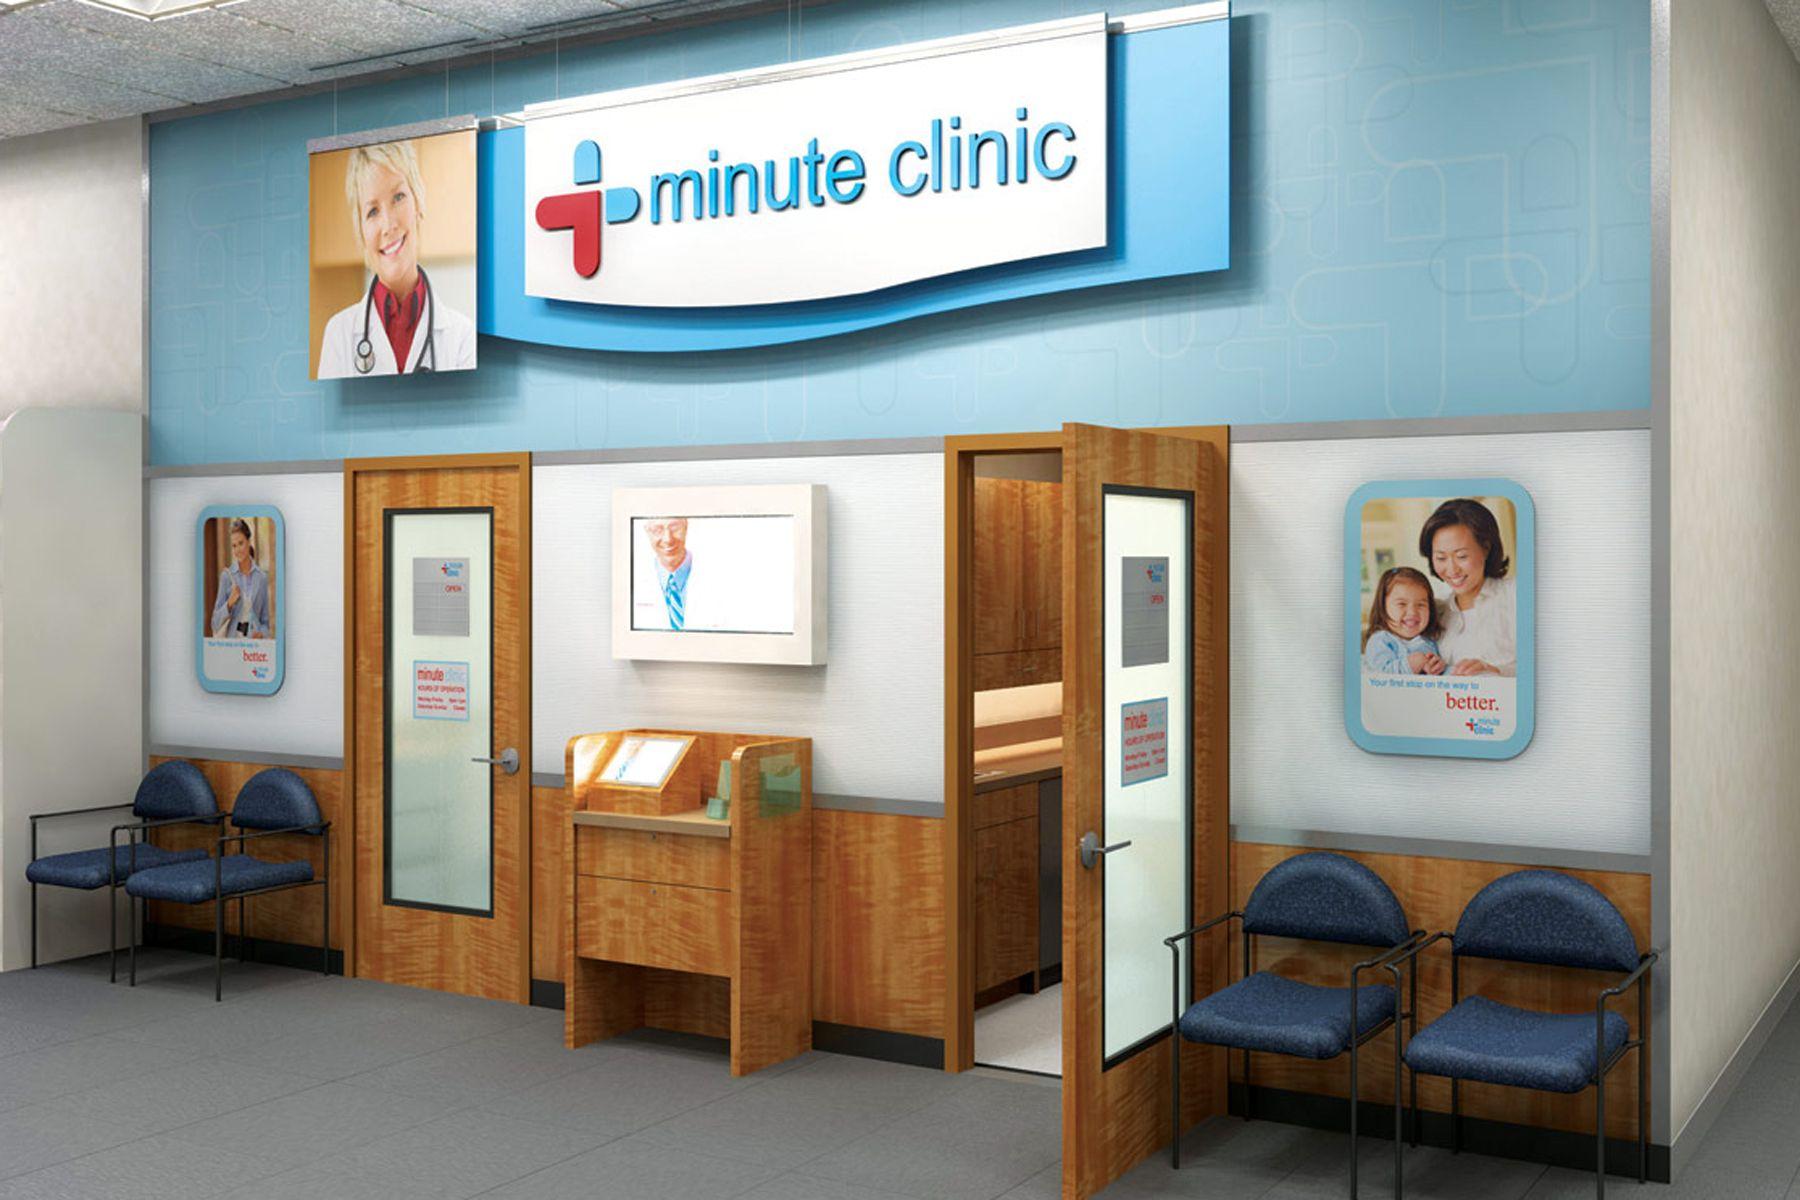 walgreens minute clinic Google Search Walk in clinic